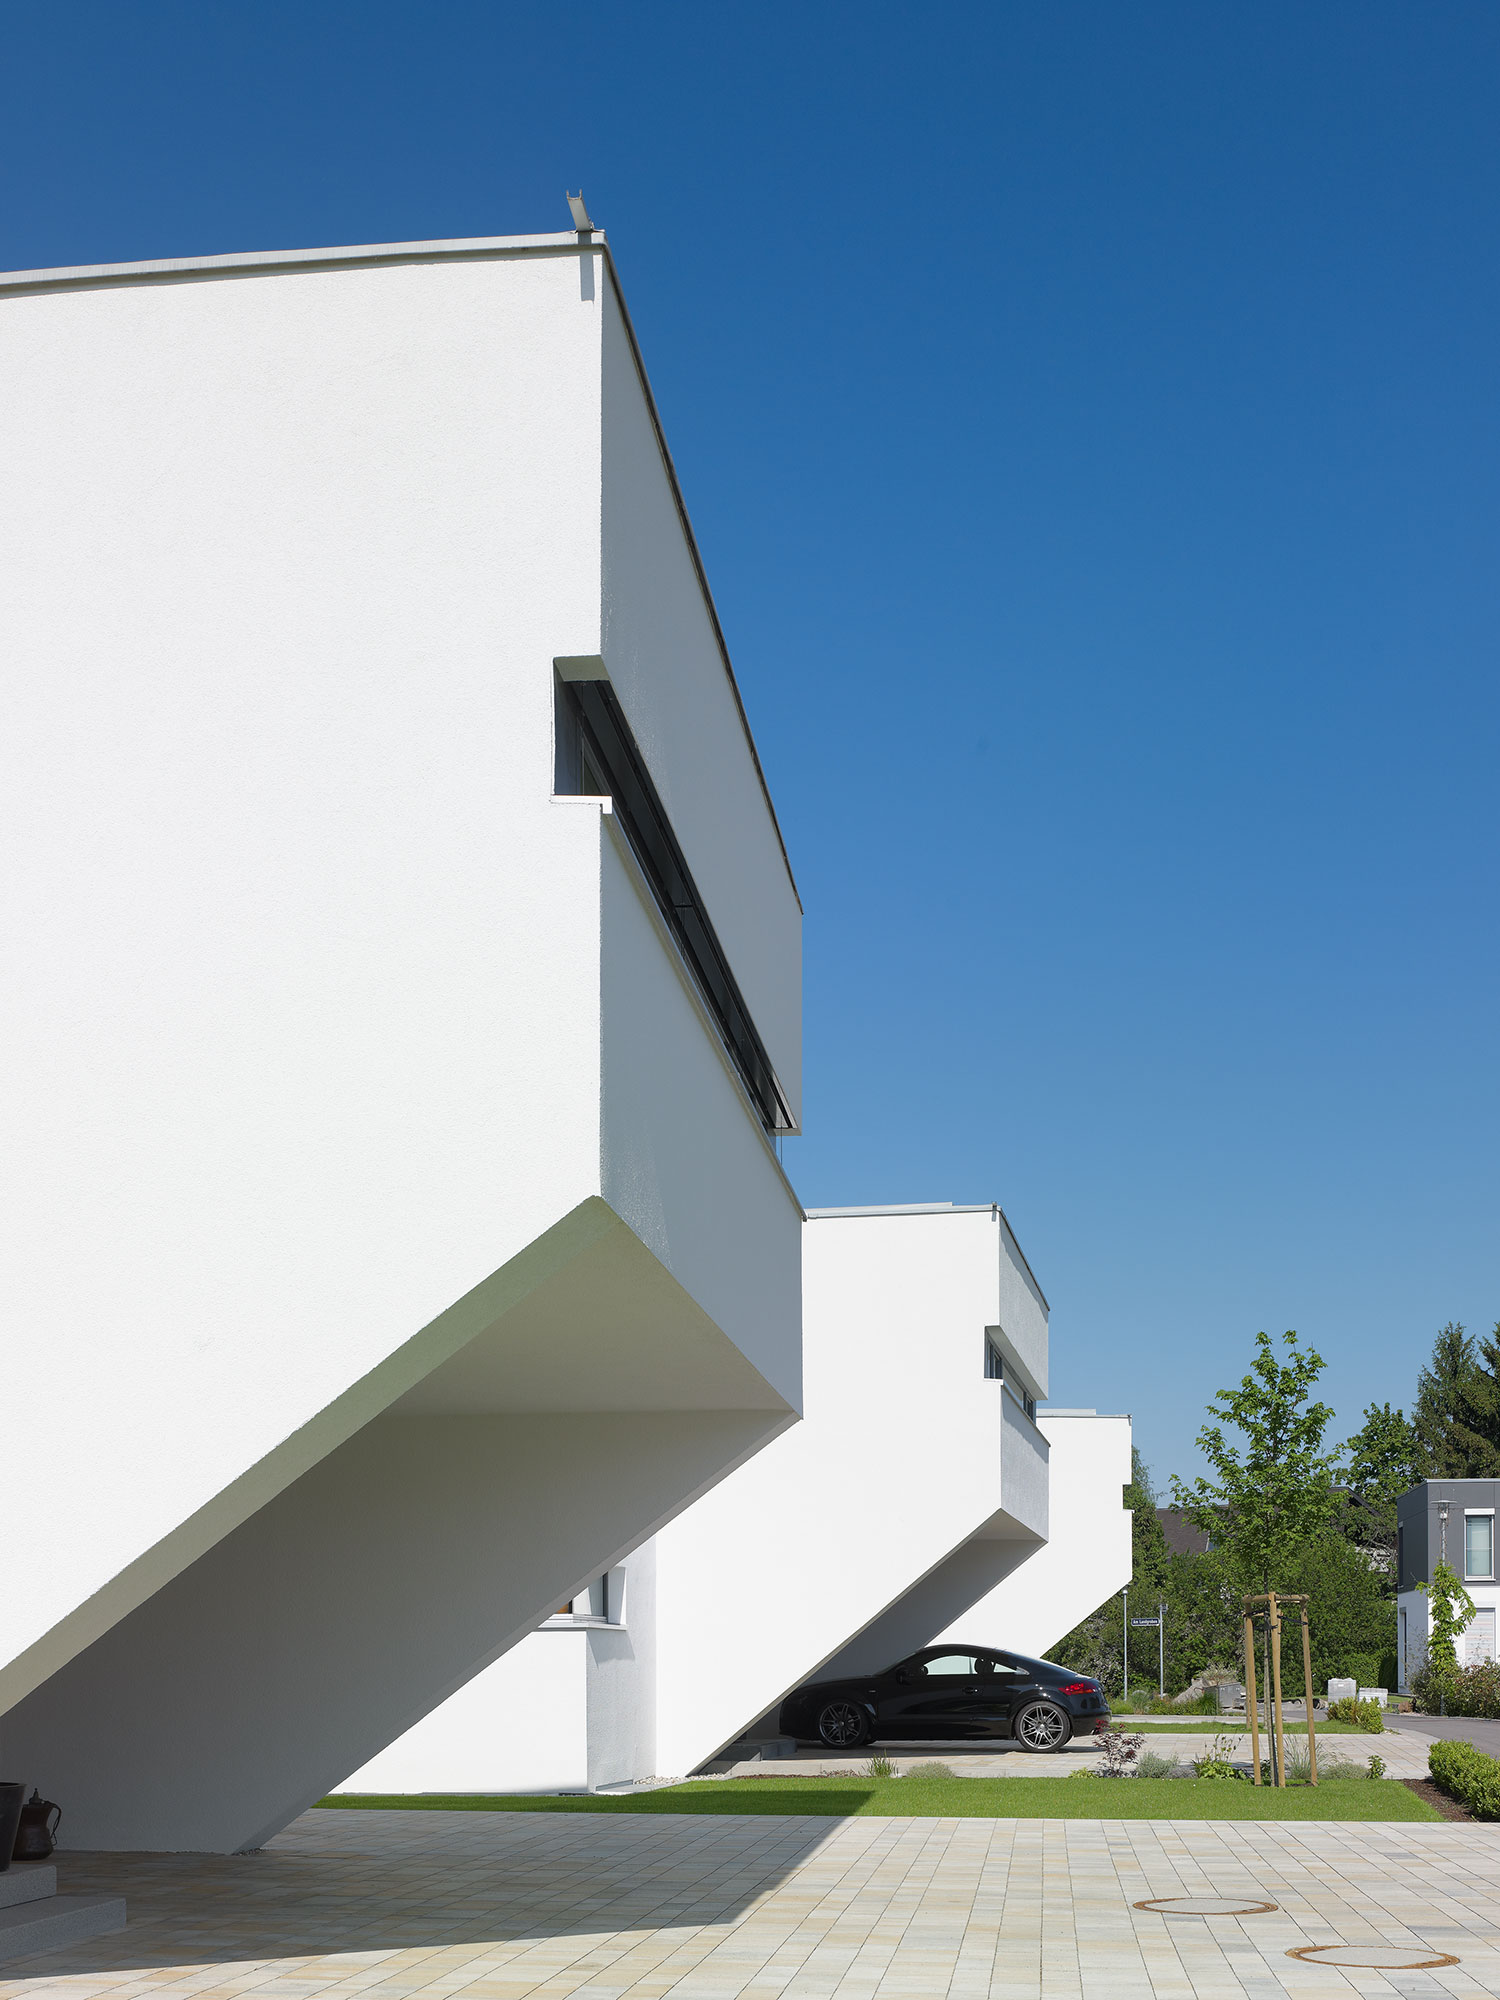 https://www.architectoo.de/images/735t.jpg